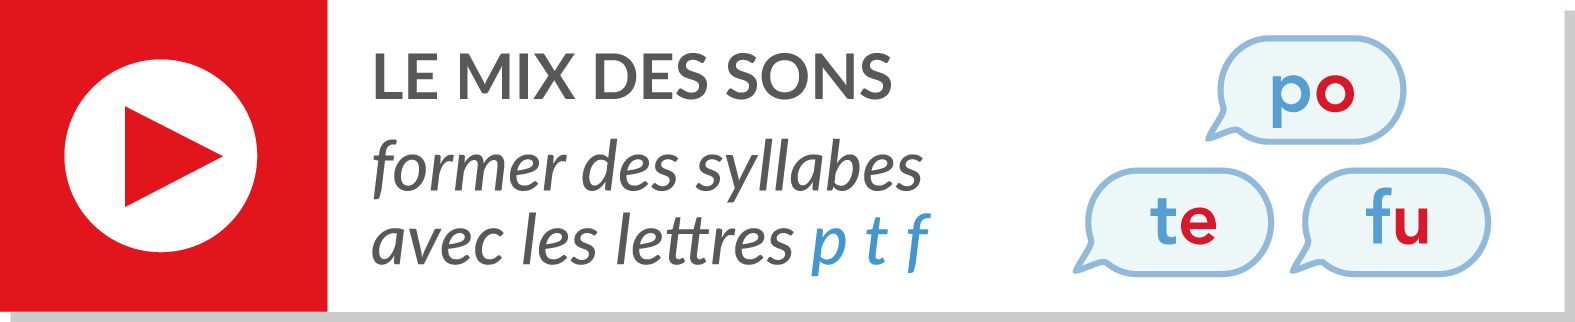 lecture de syllabes - vidéo syllabes - consonnes p t f